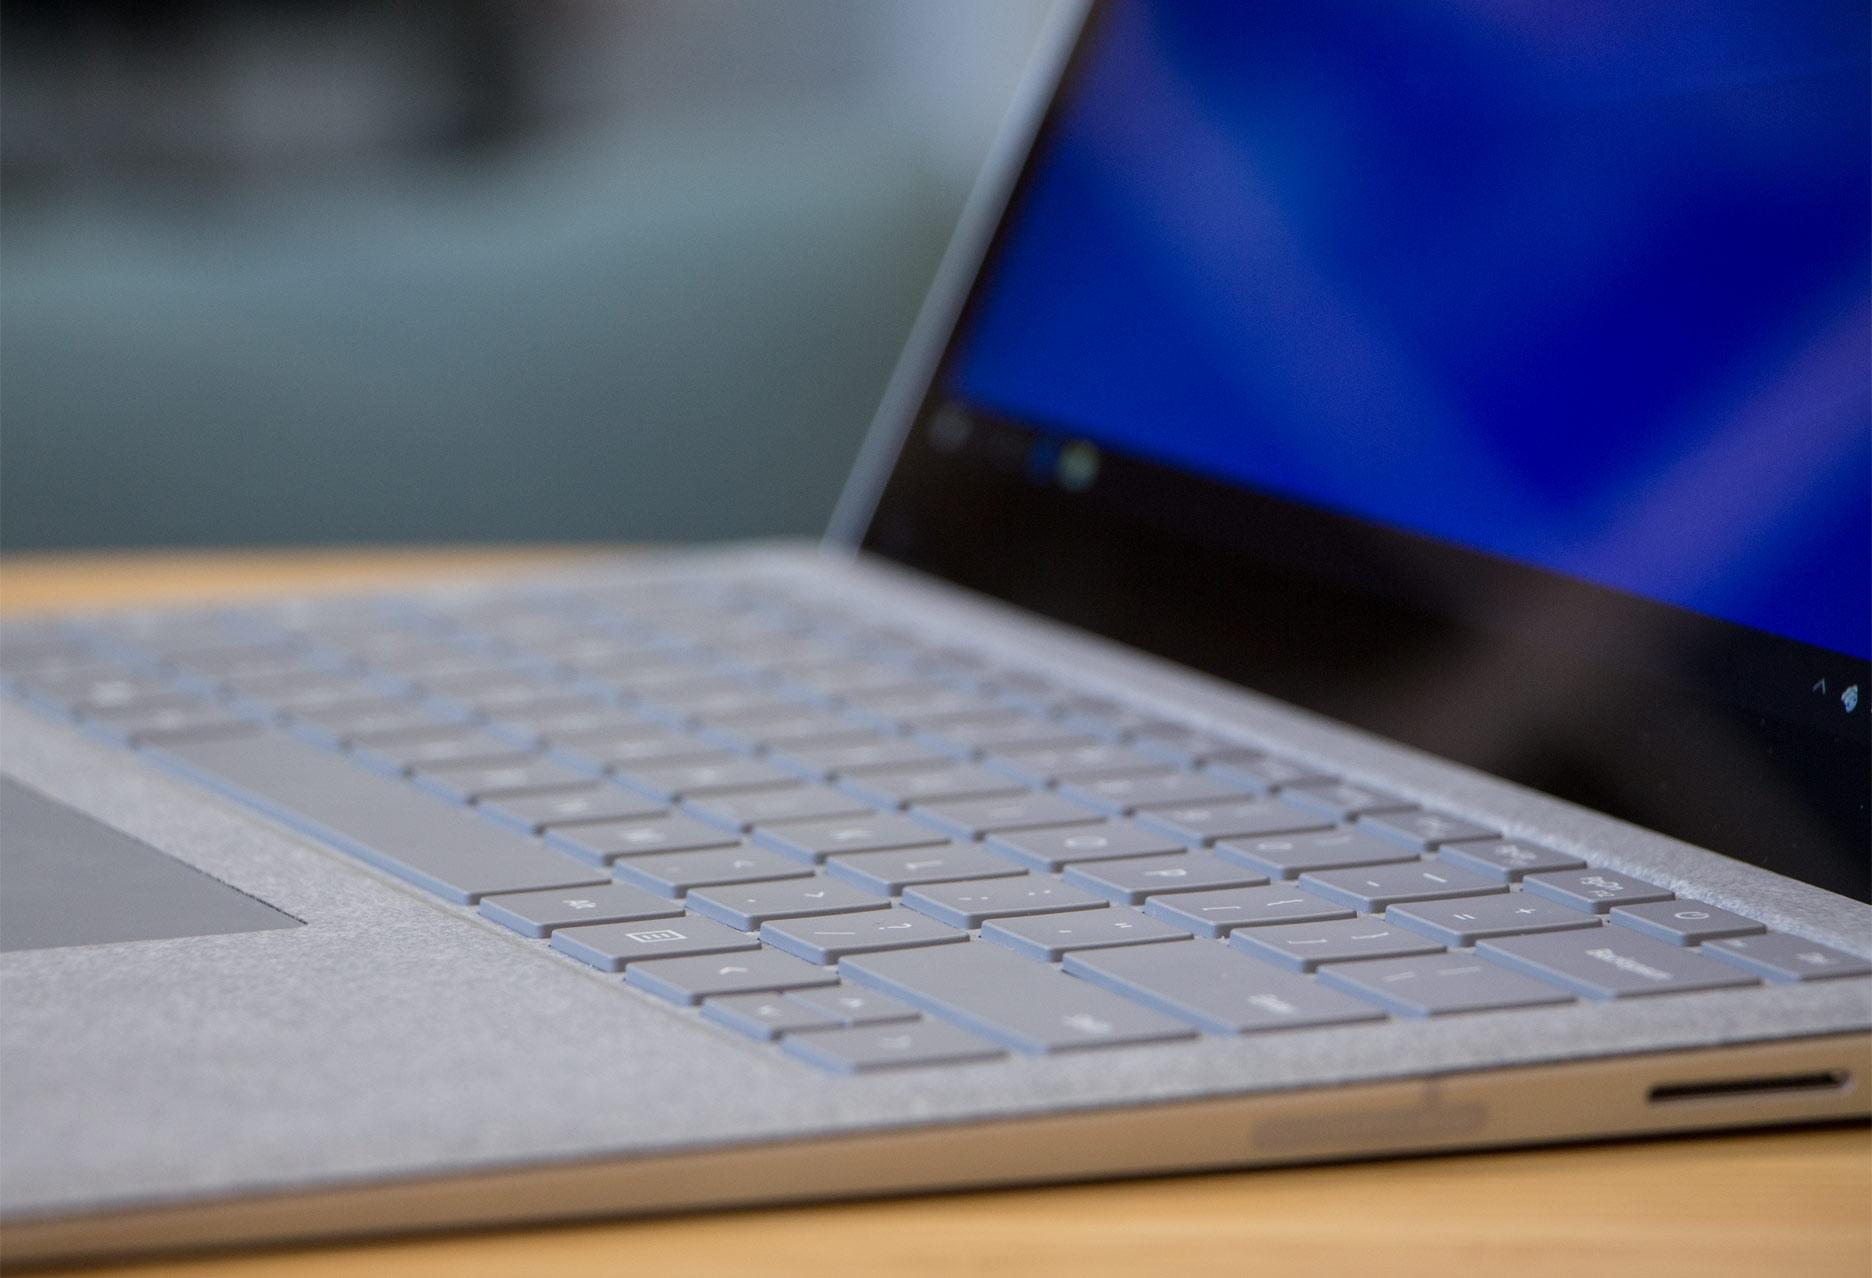 Microsoft Surface Laptop klawiatura